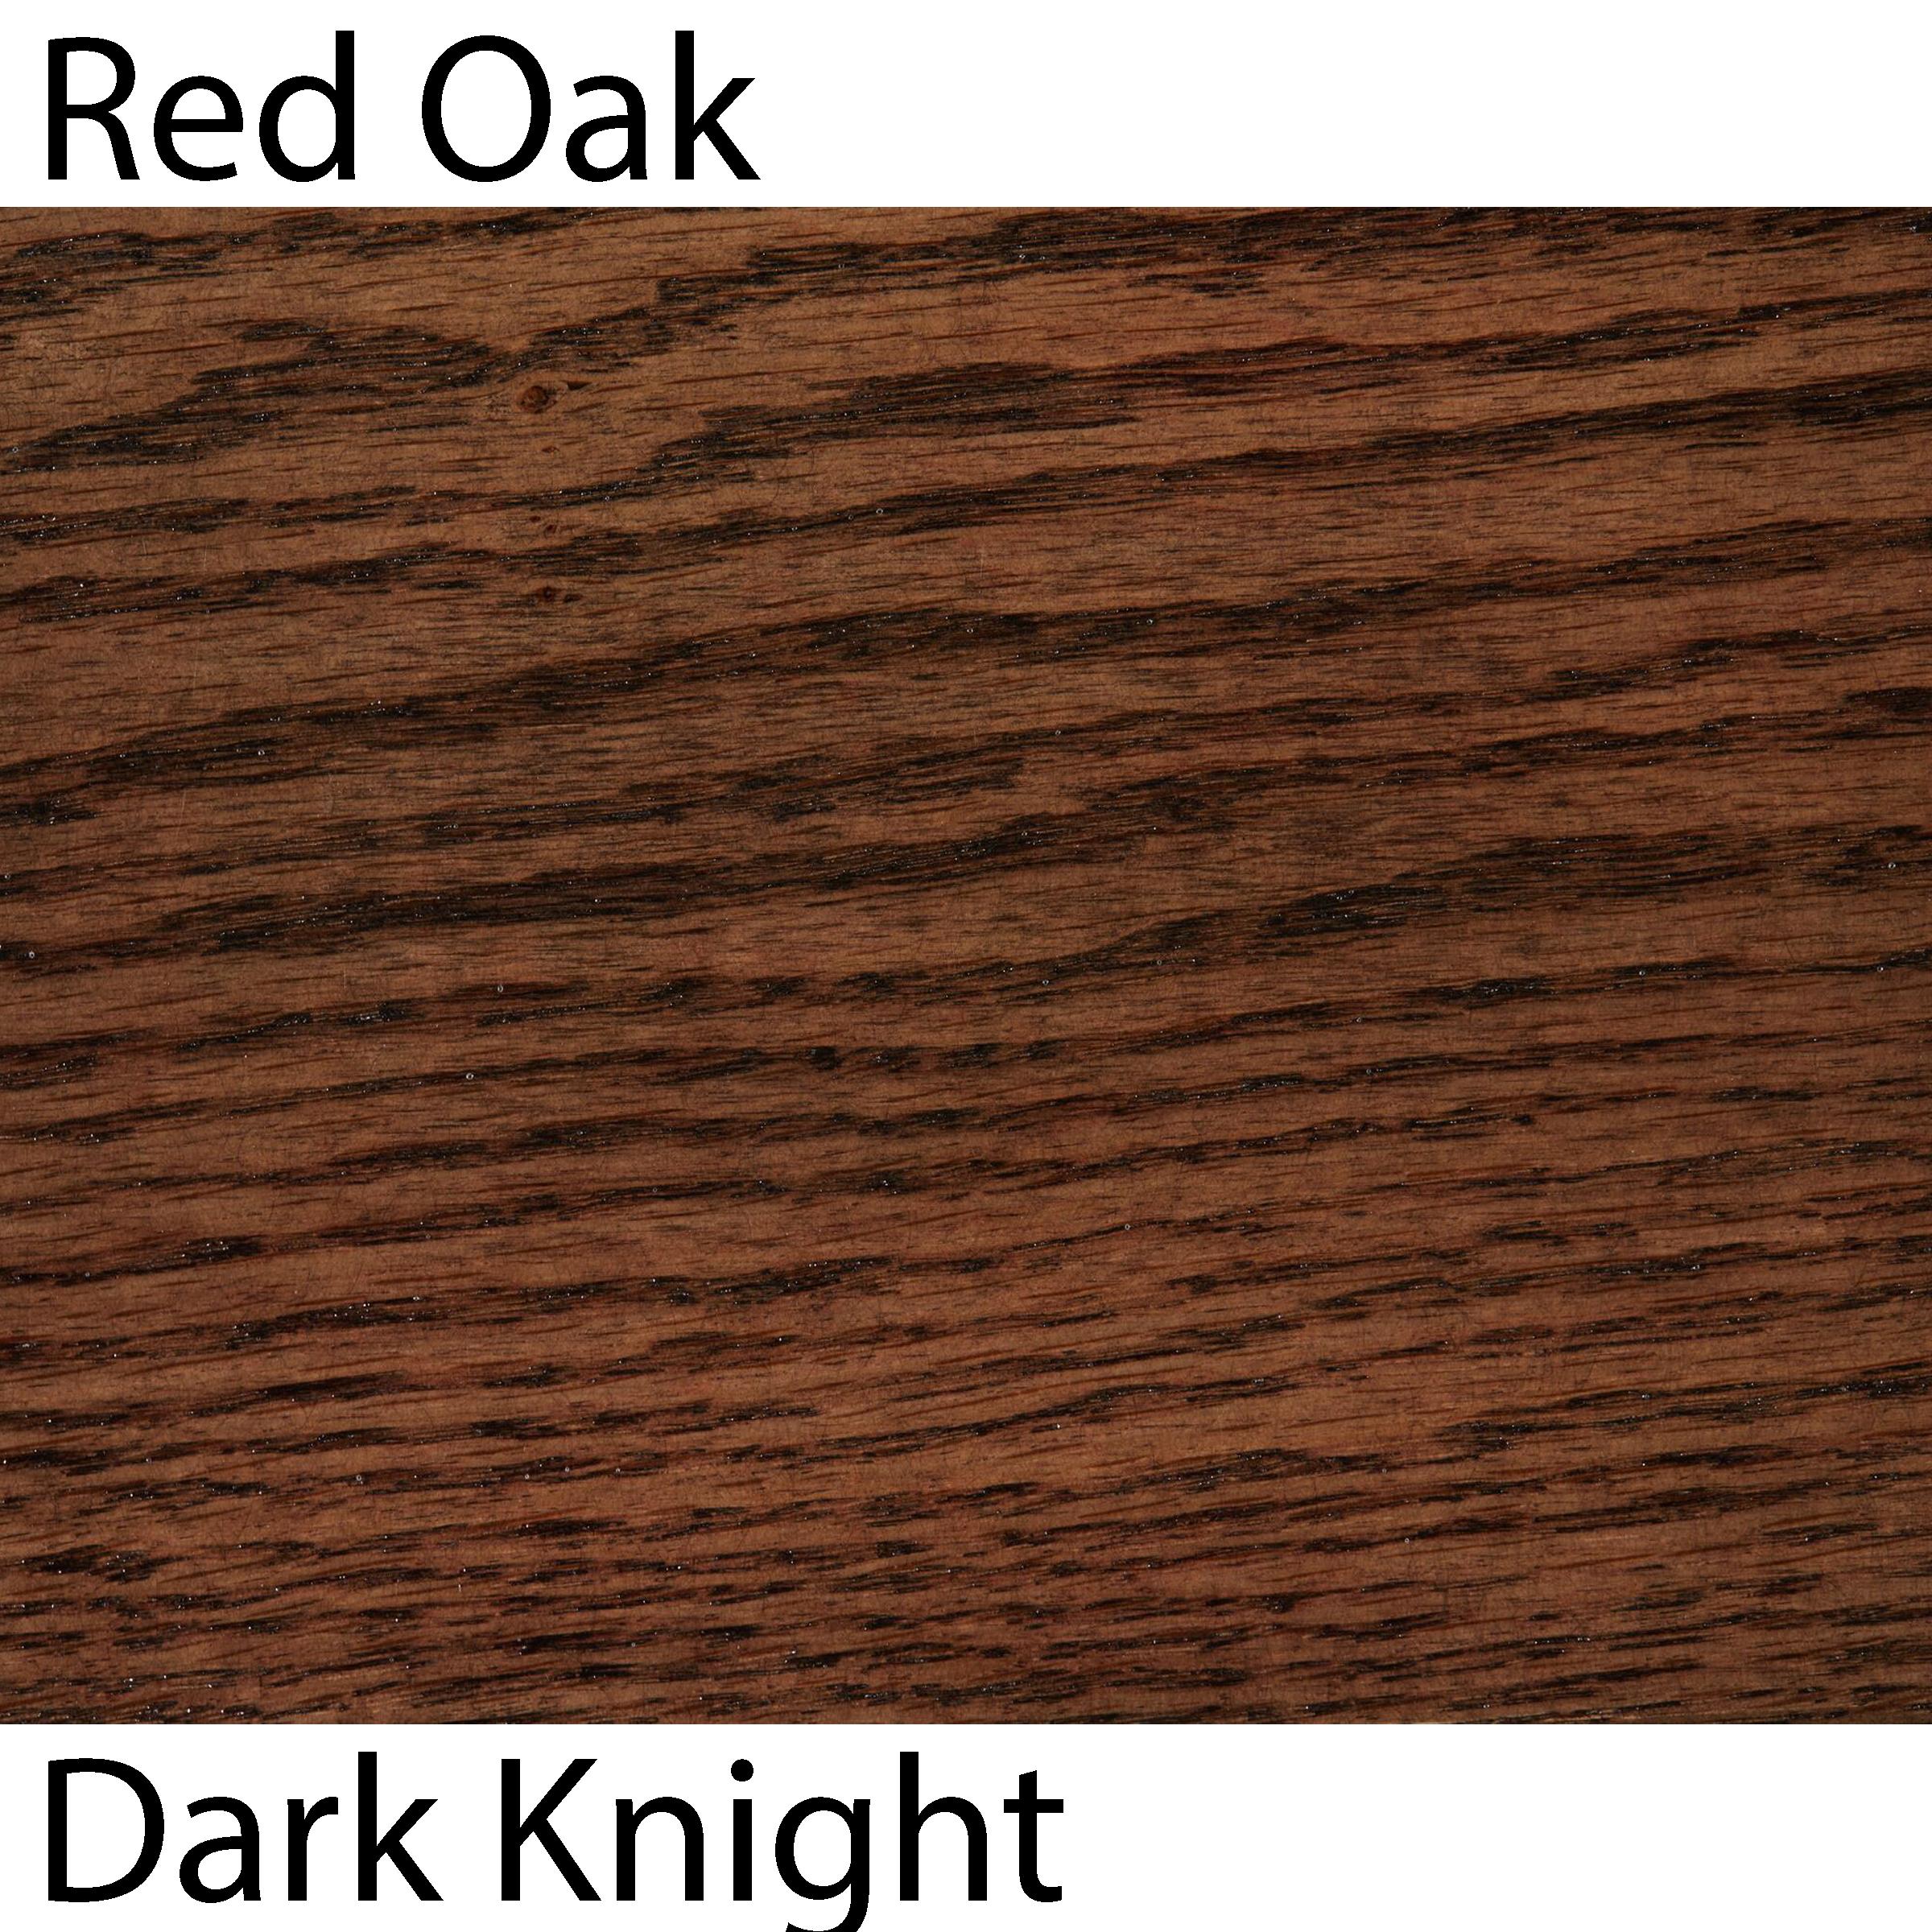 Red Oak Wood Stairsupplies